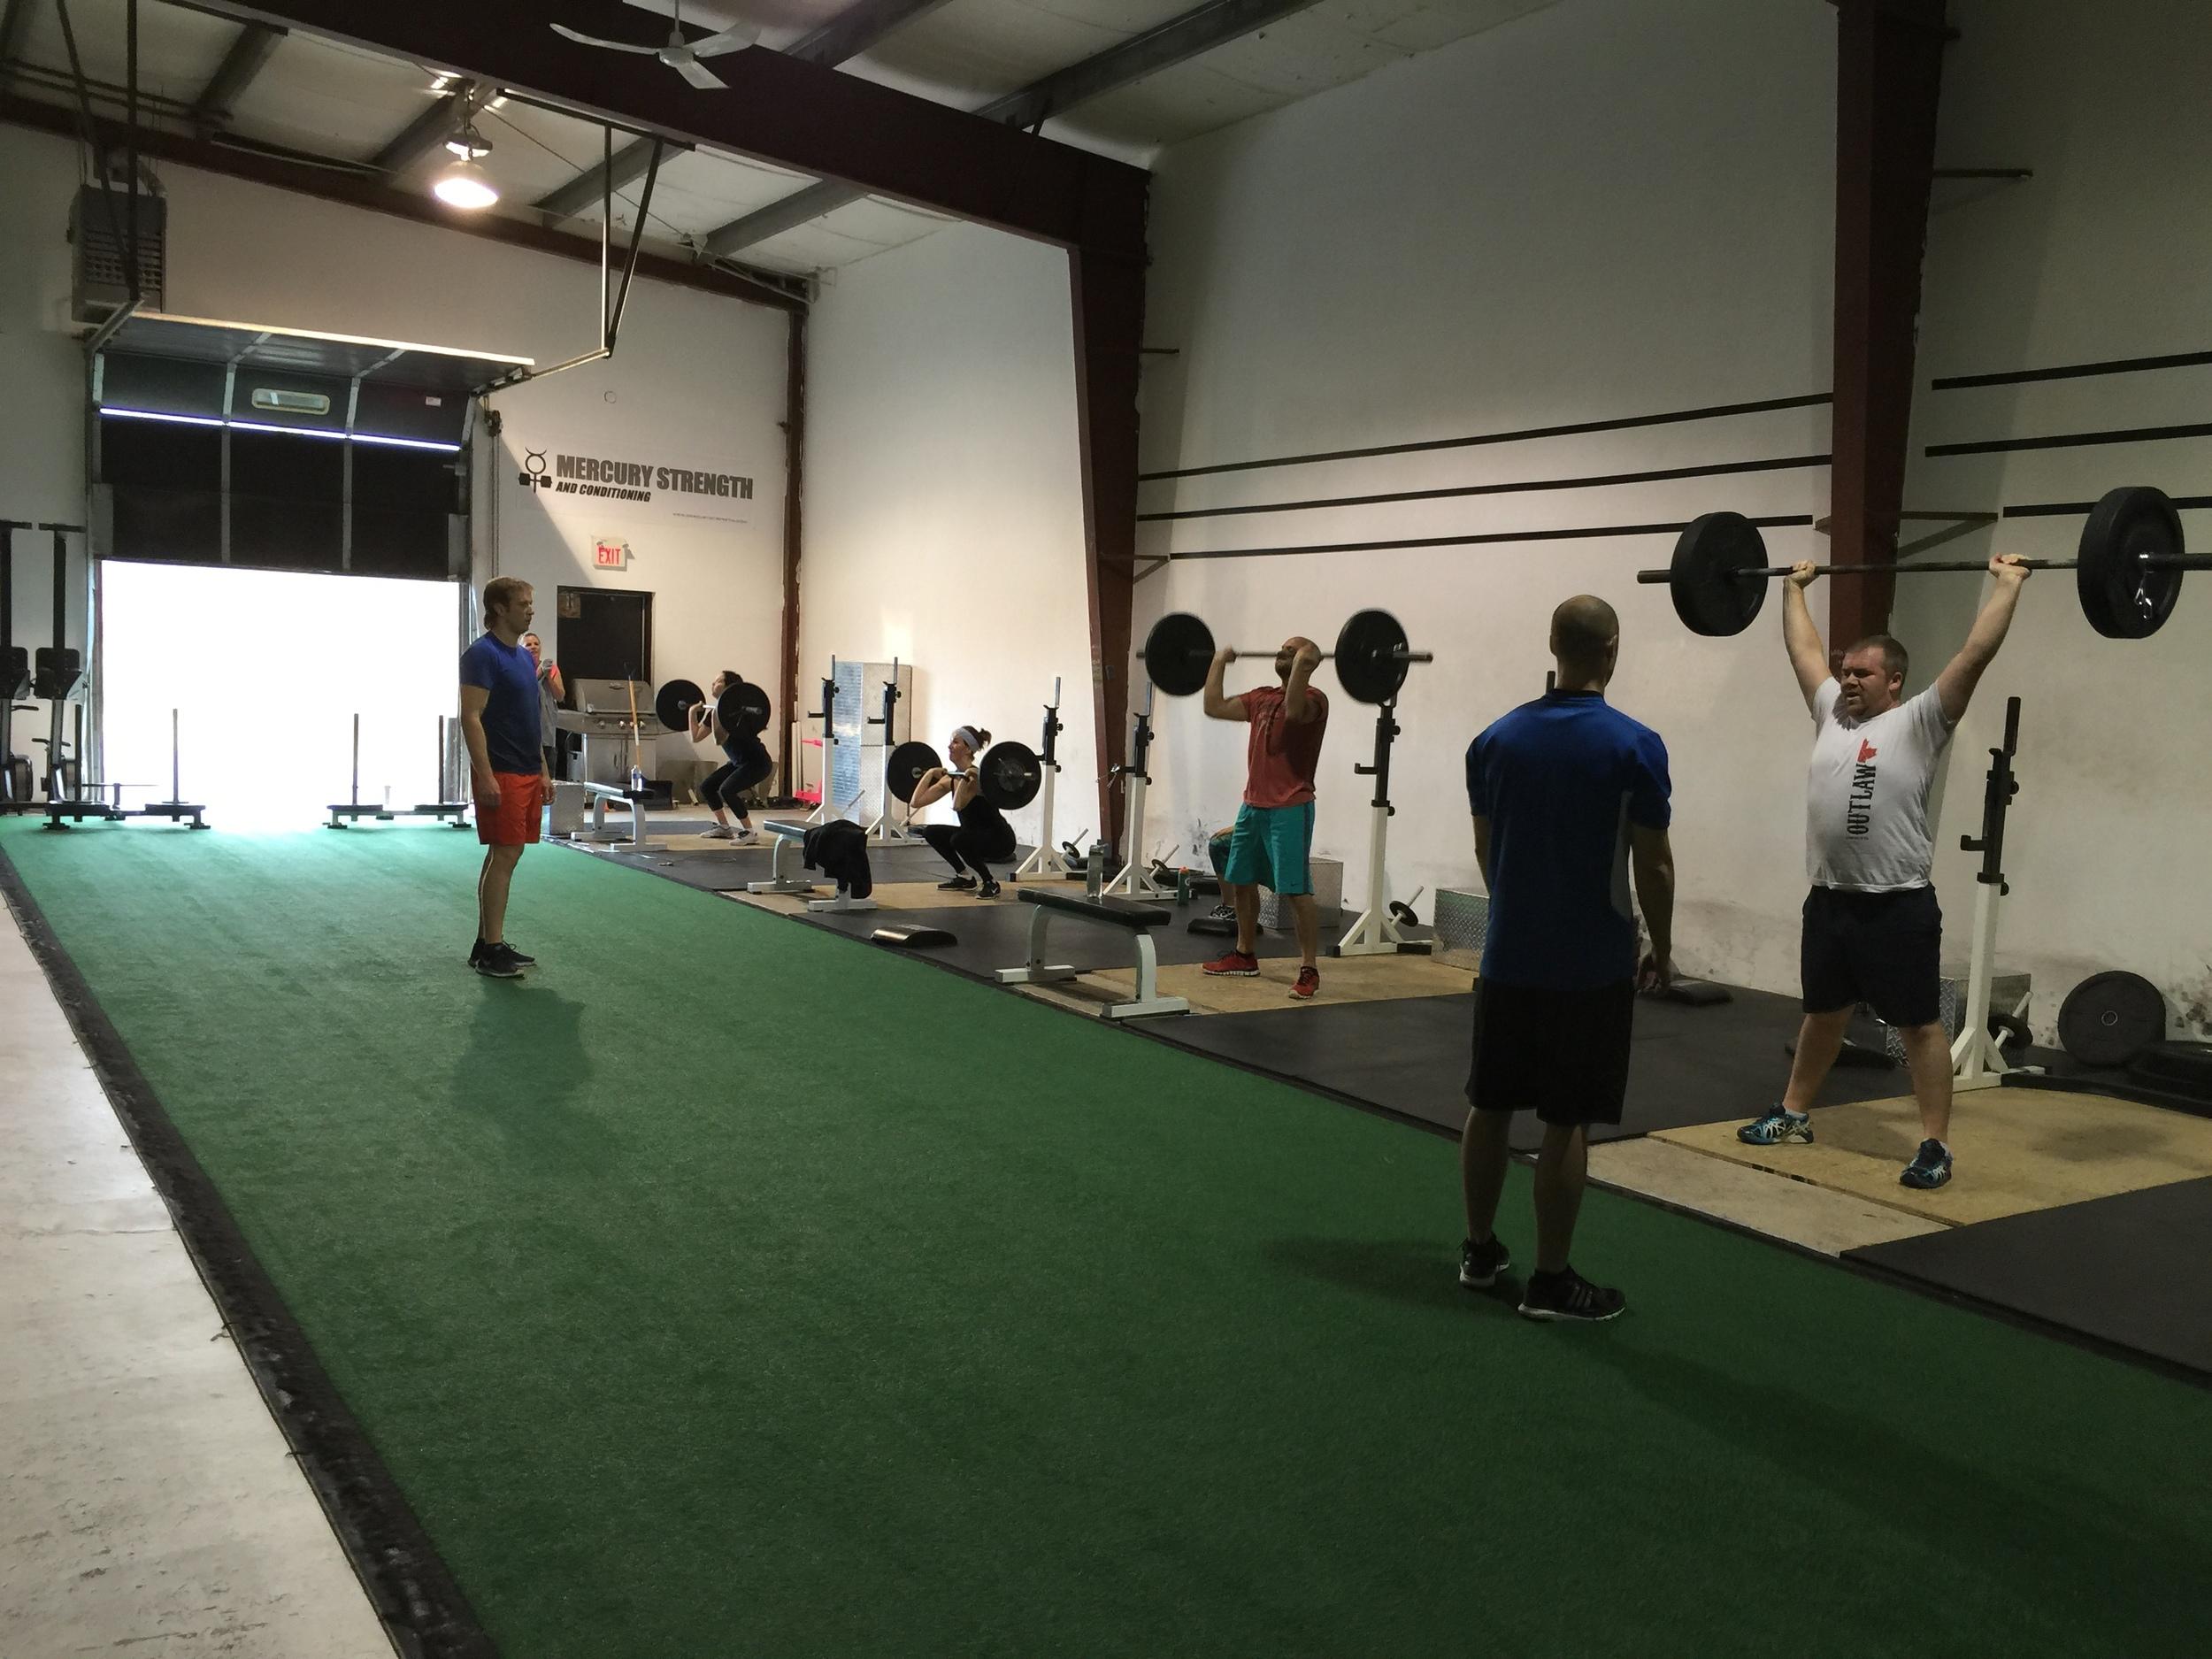 gym-fitness-training-bootcamp-kingston-thruster